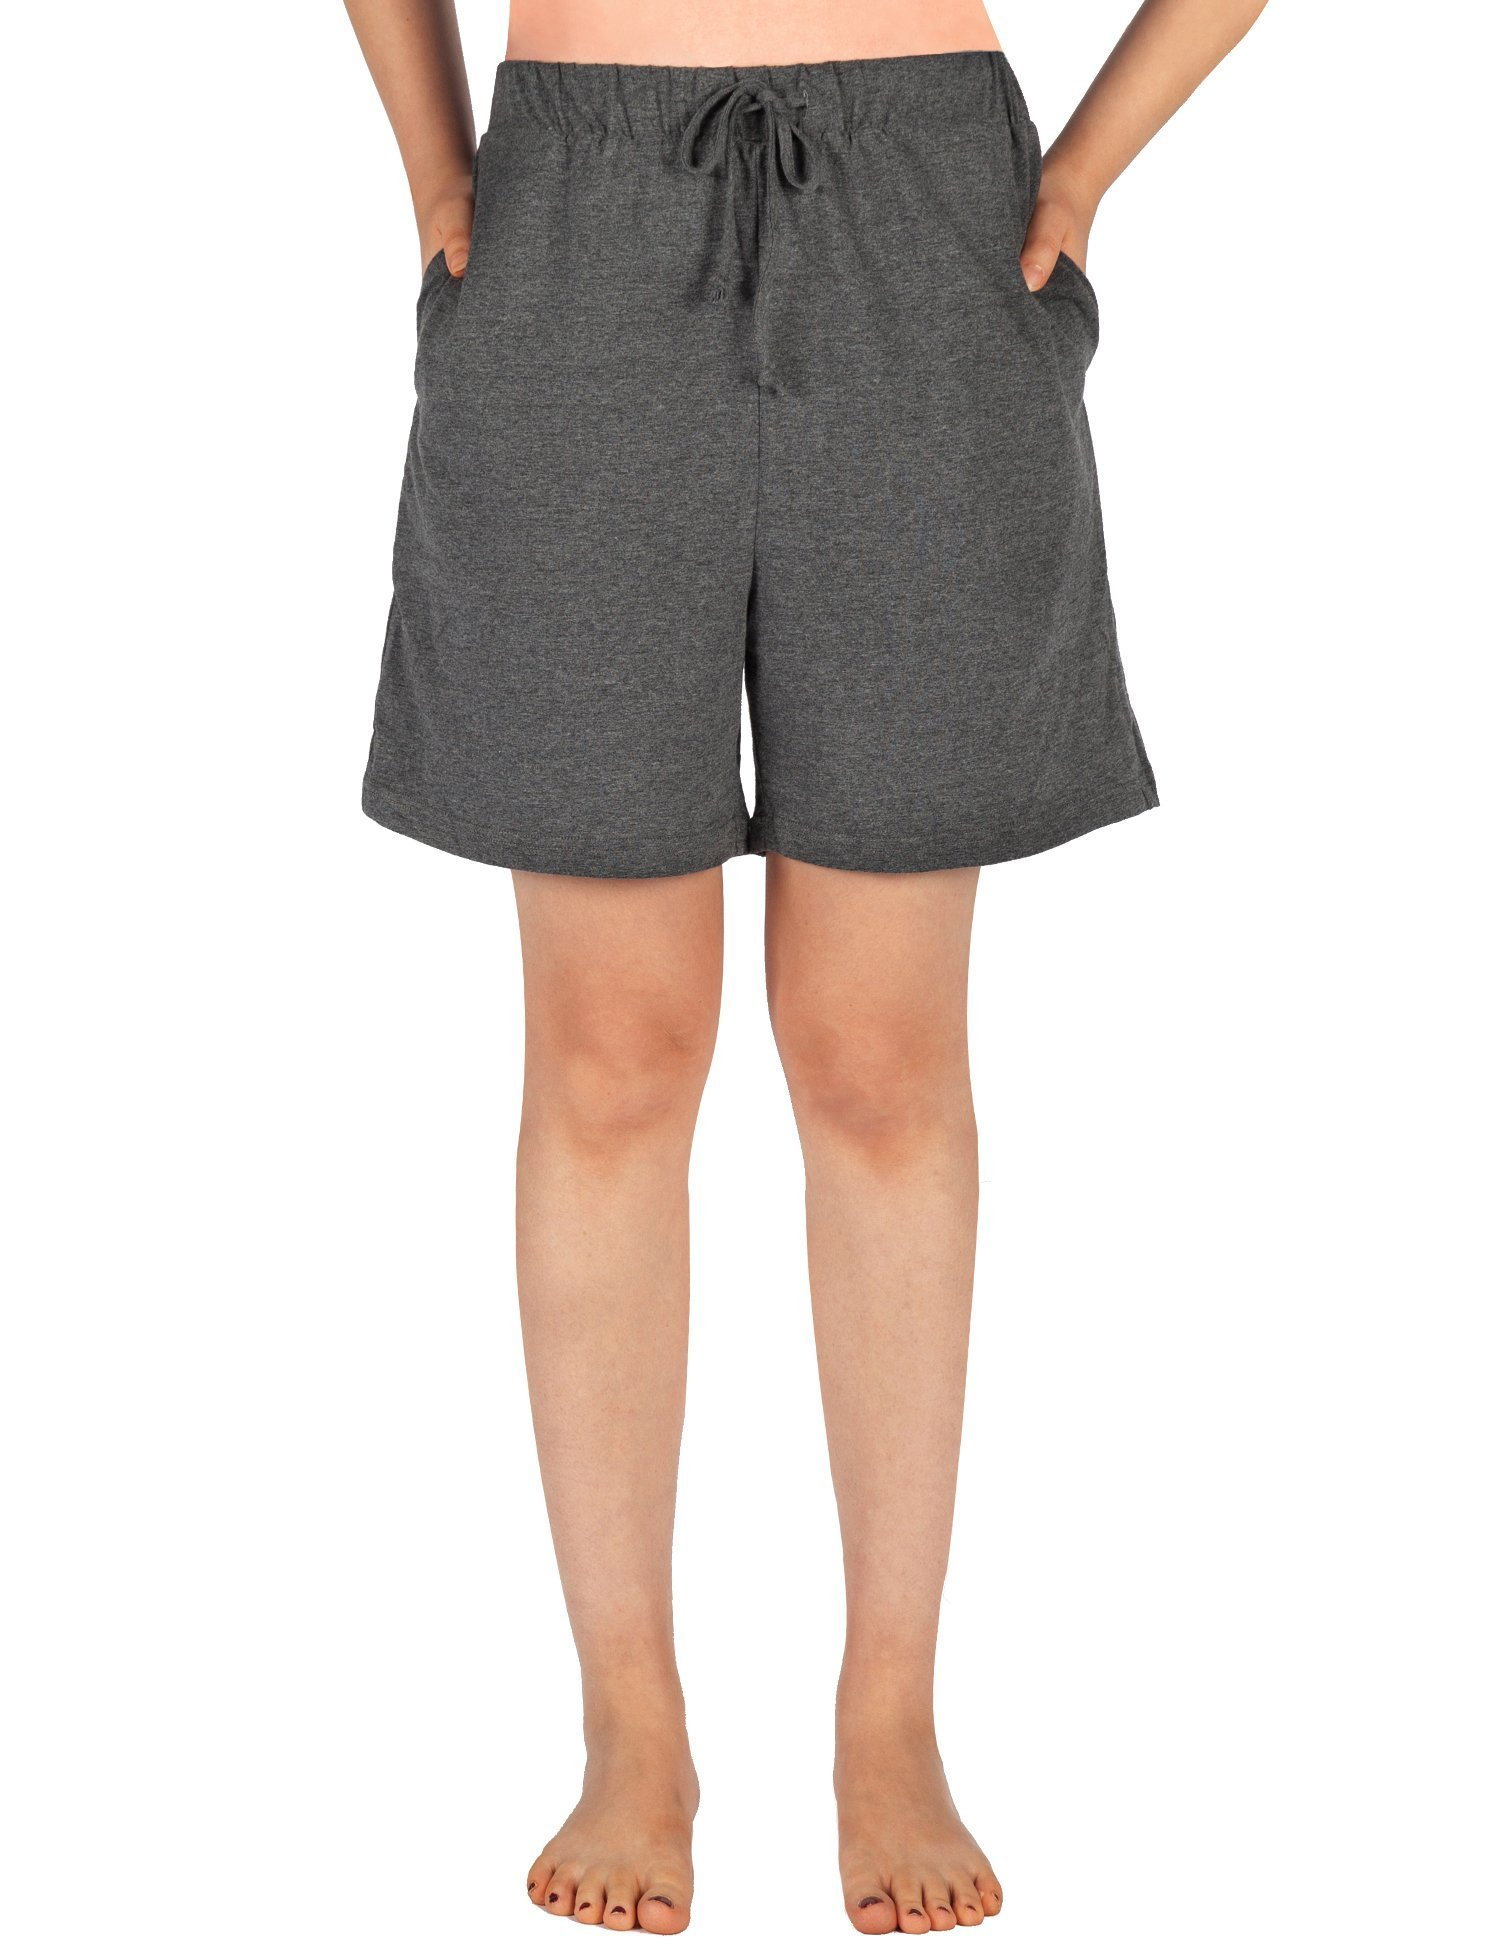 WEWINK CUKOO Women Pajamas Shorts Cotton Sleep Shorts Stretchy Lounge Shorts with Pockets (L=US 12-14, Granite Gray)